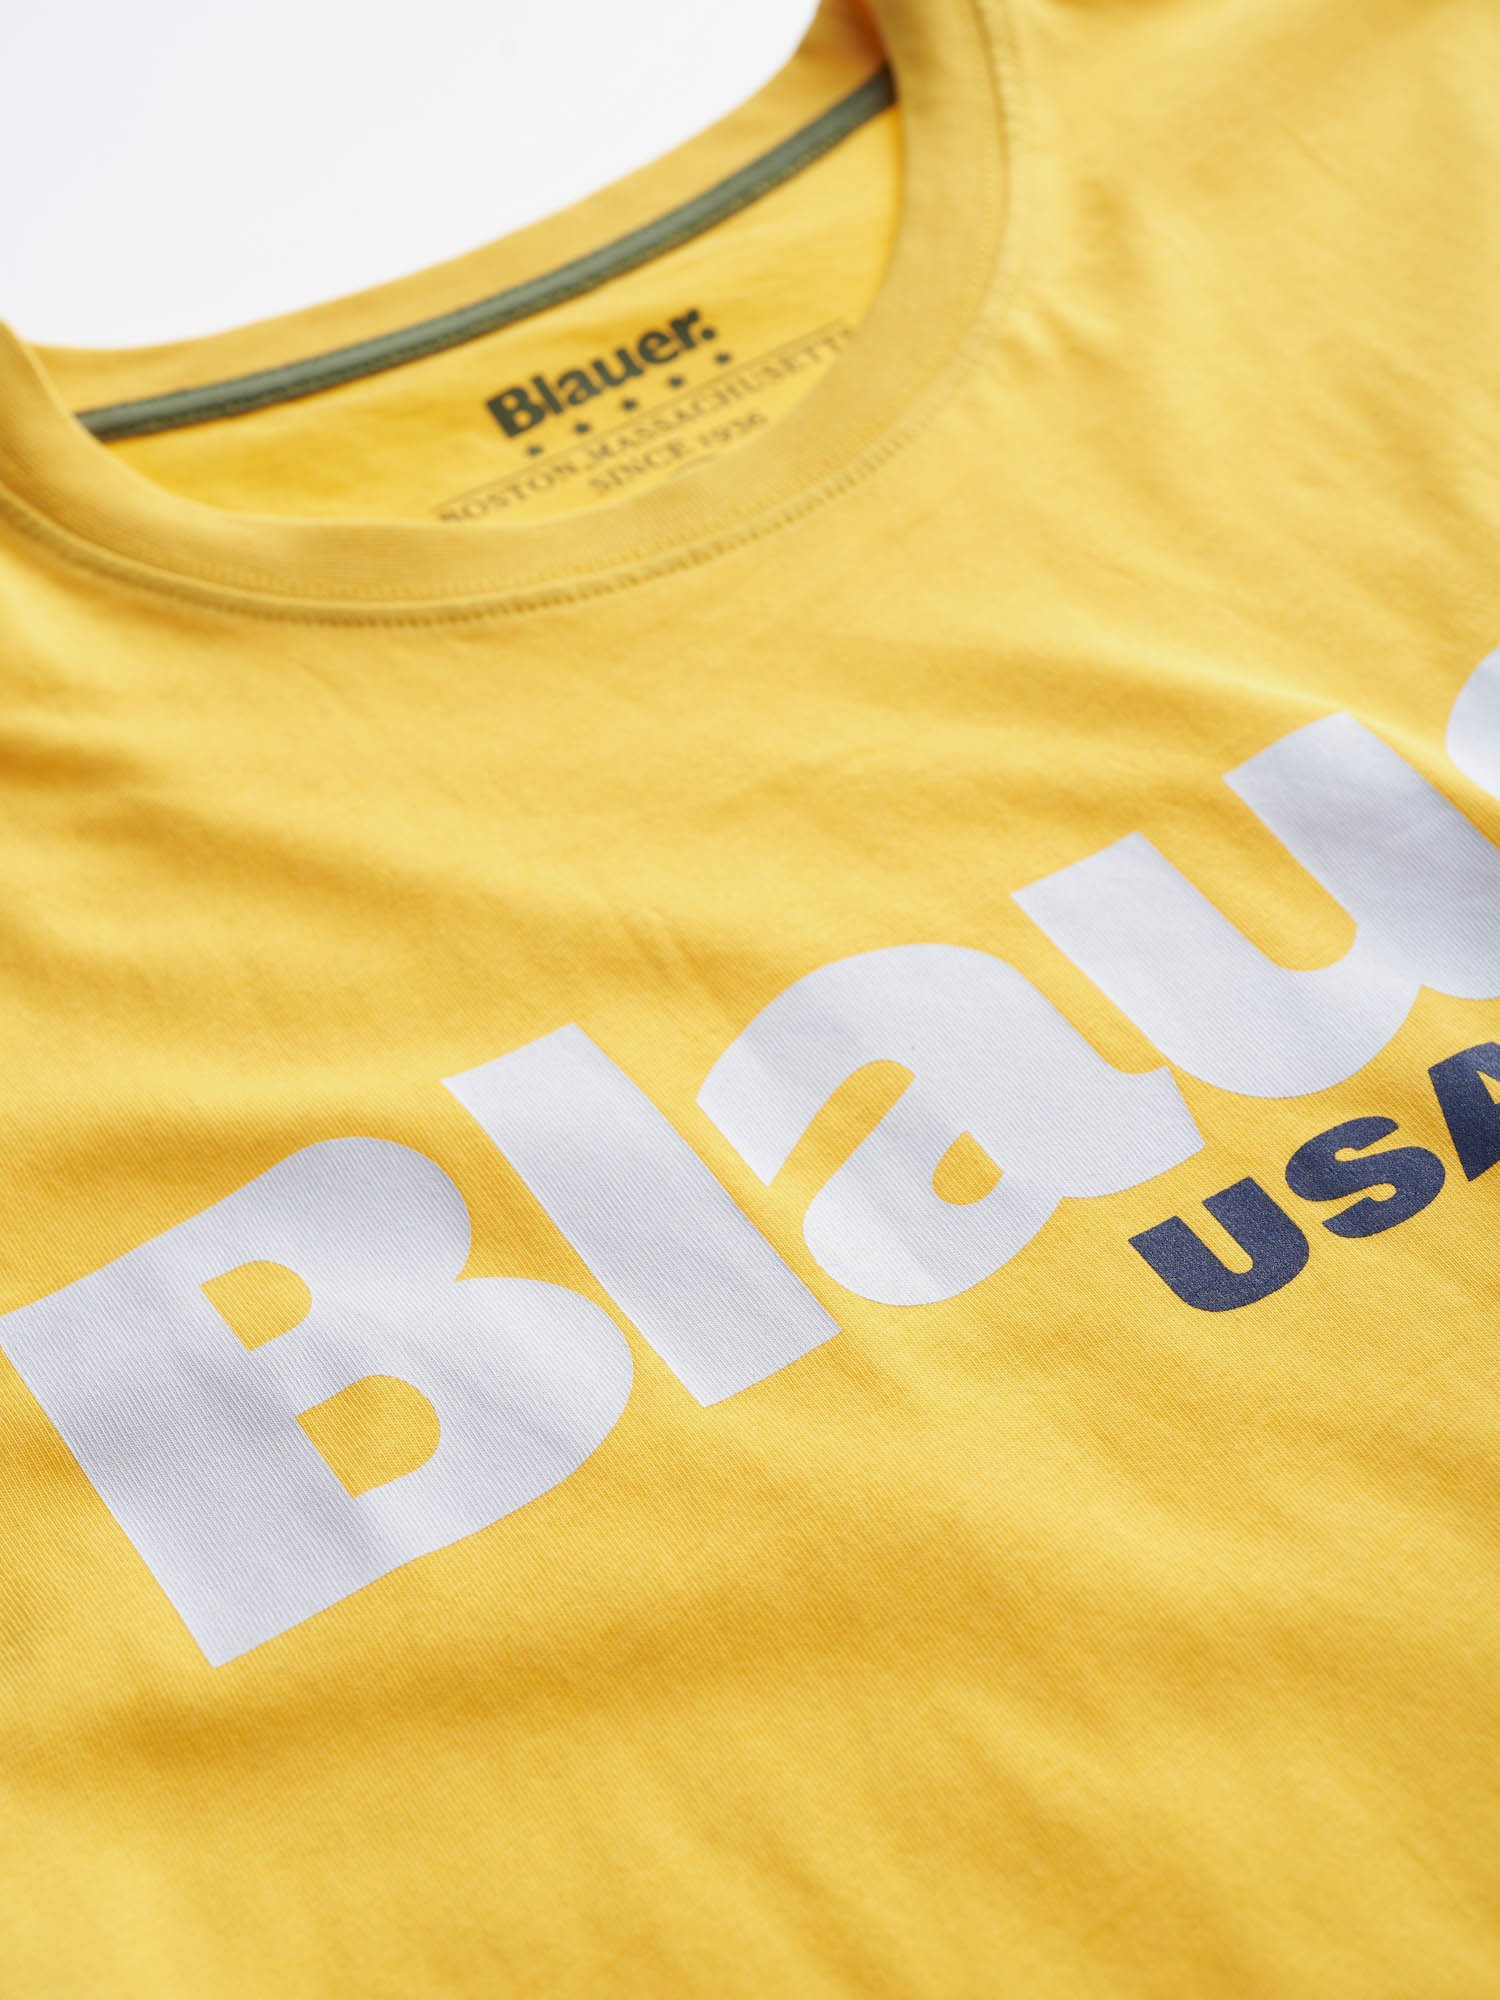 T-SHIRT BLAUER USA BLAUER | T-shirt | 20SBLUH02170 004547223 CANARINO